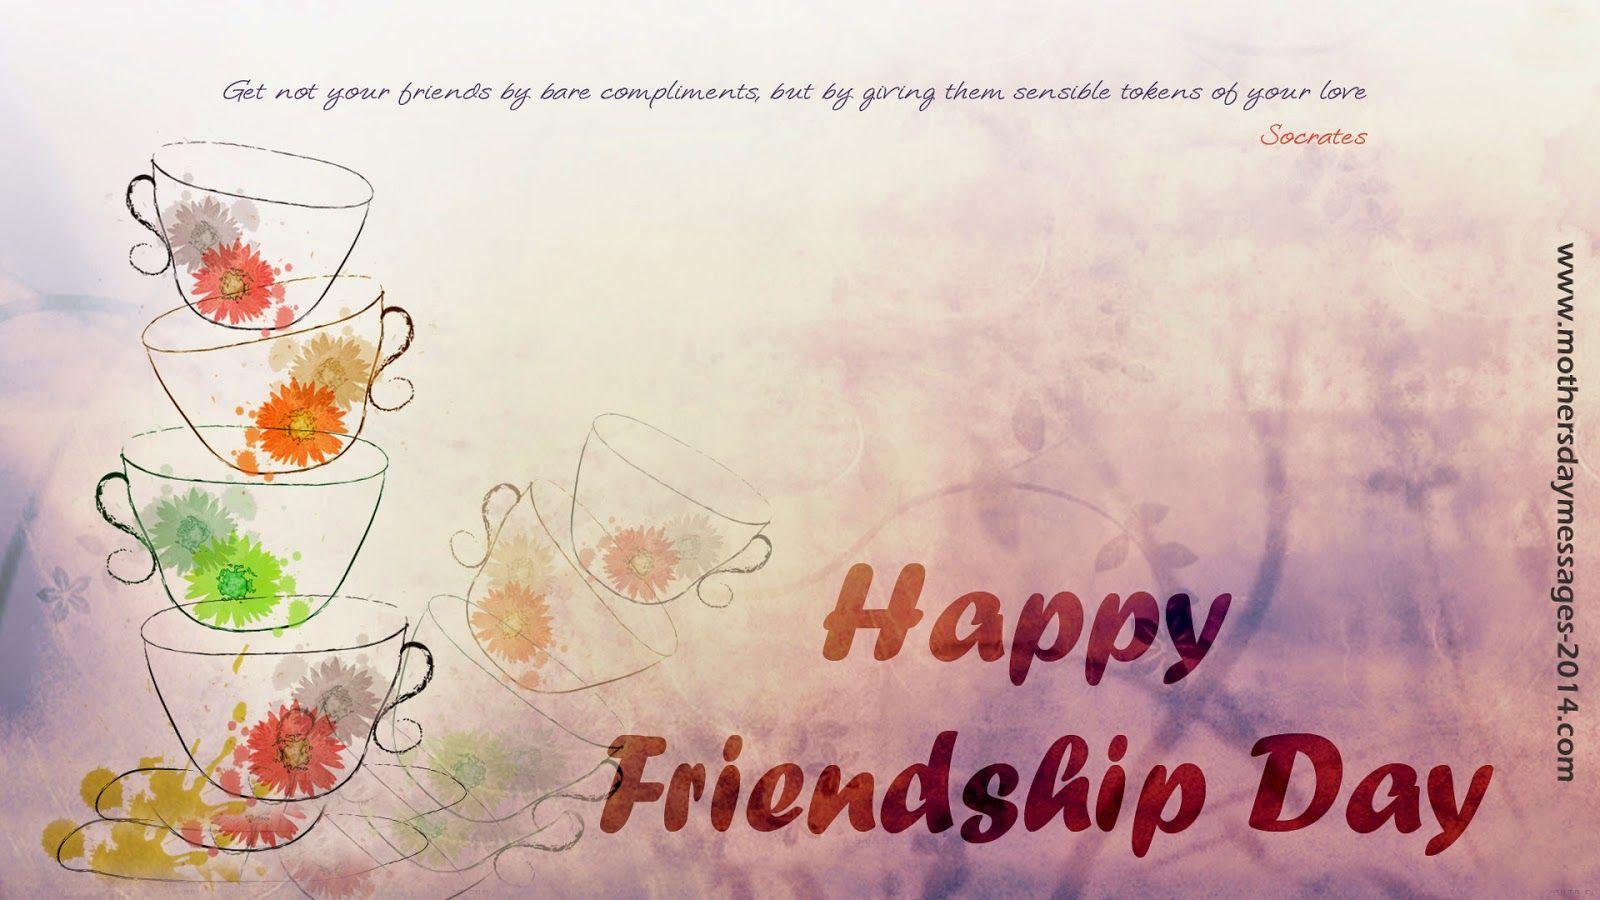 Happy Friendship Day Wallpaper Free Desktop Backgrounds Friendship Day Wallpaper Happy Friendship Day Happy Friendship